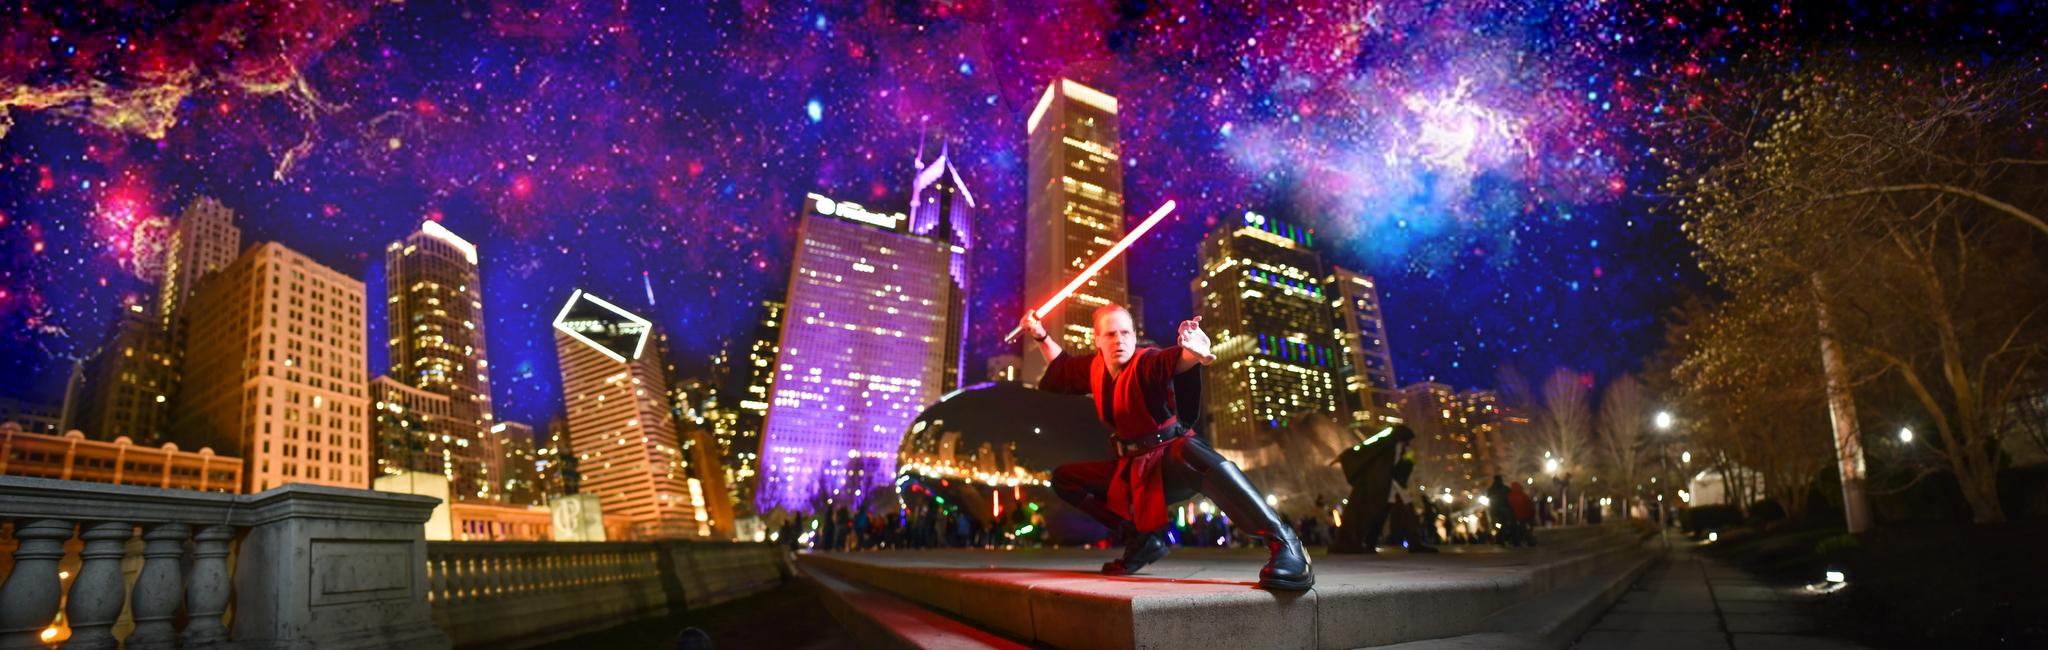 2019.04.14 - Star Wars Celebration Chicago 288840.JPG